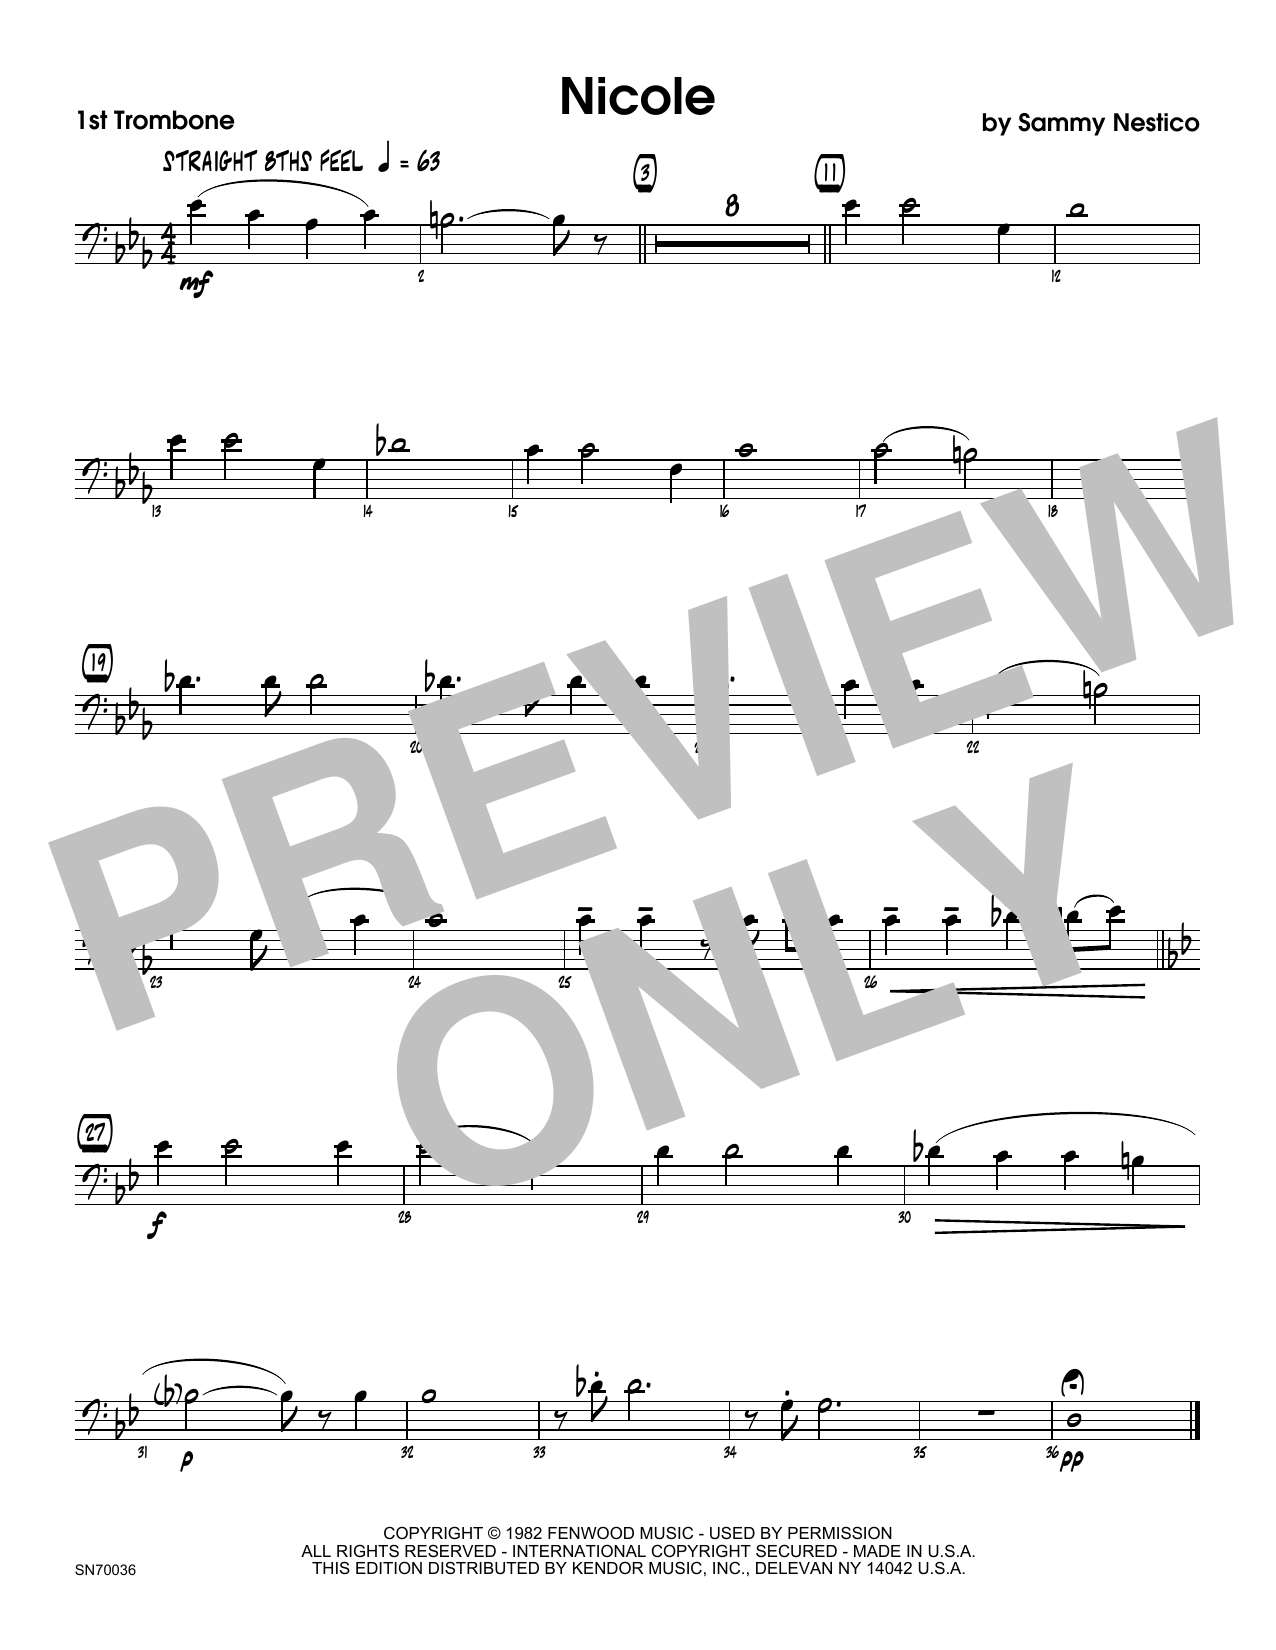 Nicole - 1st Trombone Sheet Music